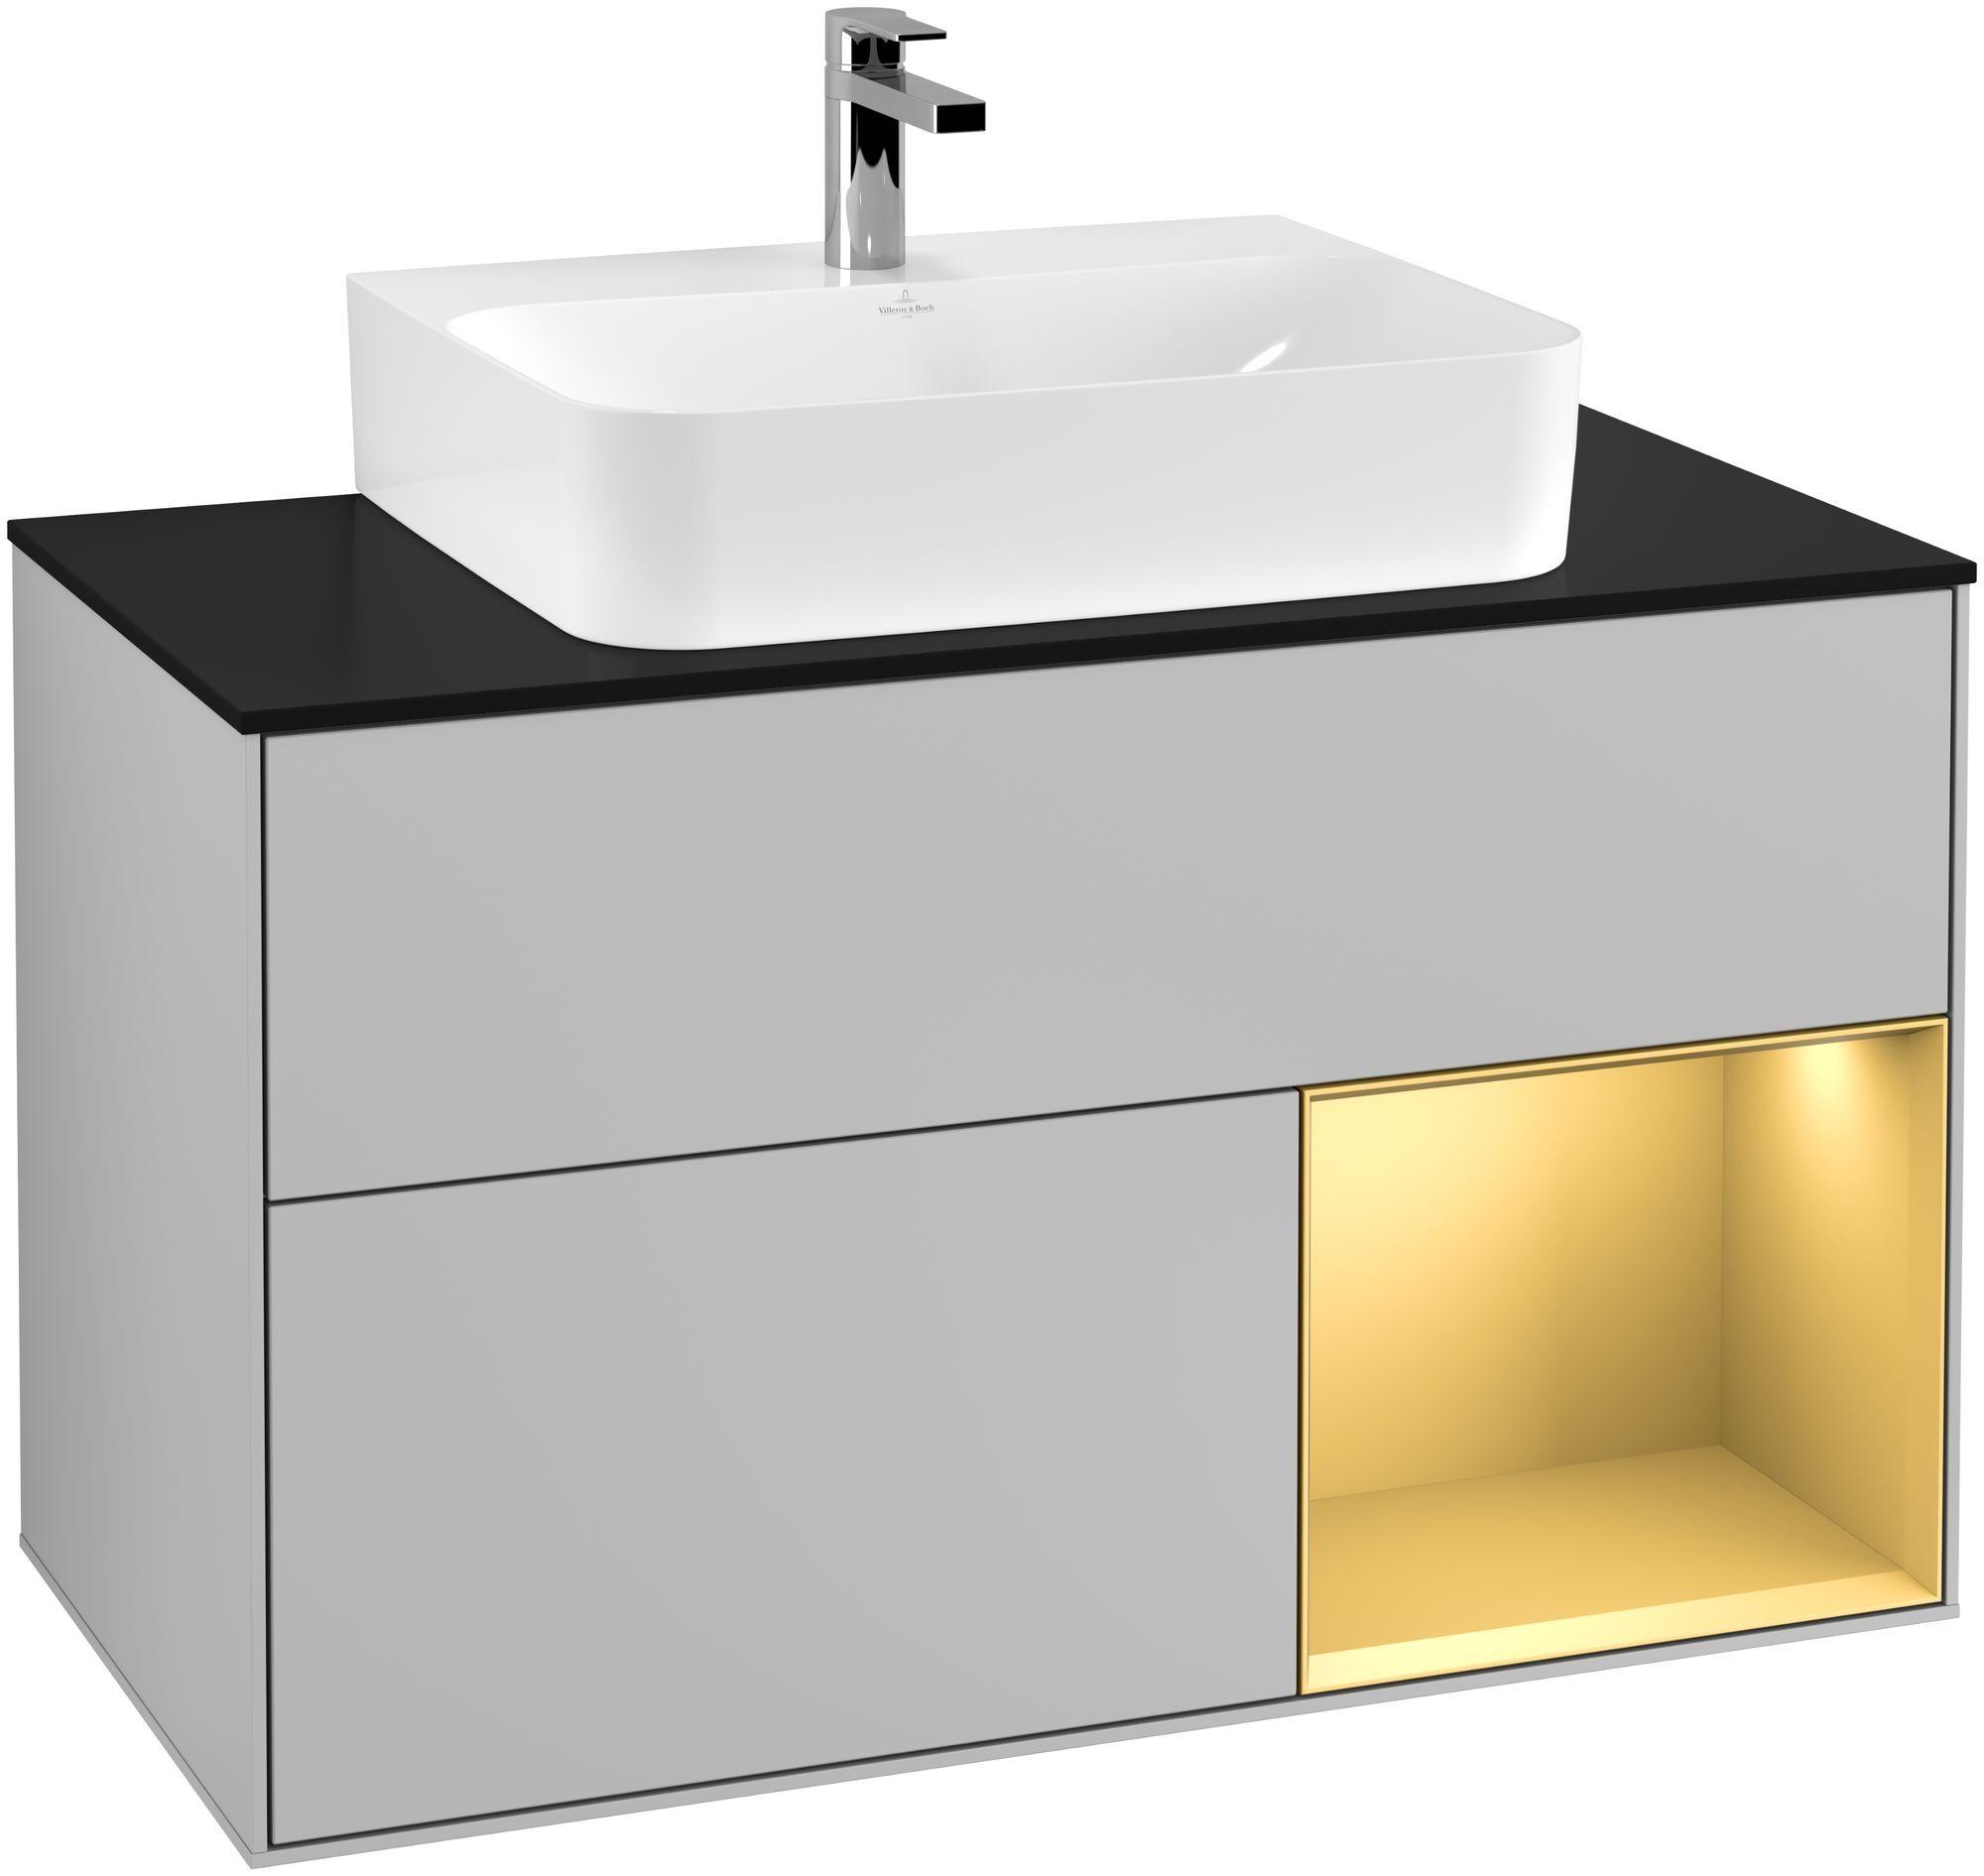 Villeroy & Boch Finion F12 Waschtischunterschrank mit Regalelement 2 Auszüge für WT mittig LED-Beleuchtung B:100xH:60,3xT:50,1cm Front, Korpus: Light Grey Matt, Regal: Gold Matt, Glasplatte: Black Matt F122HFGJ